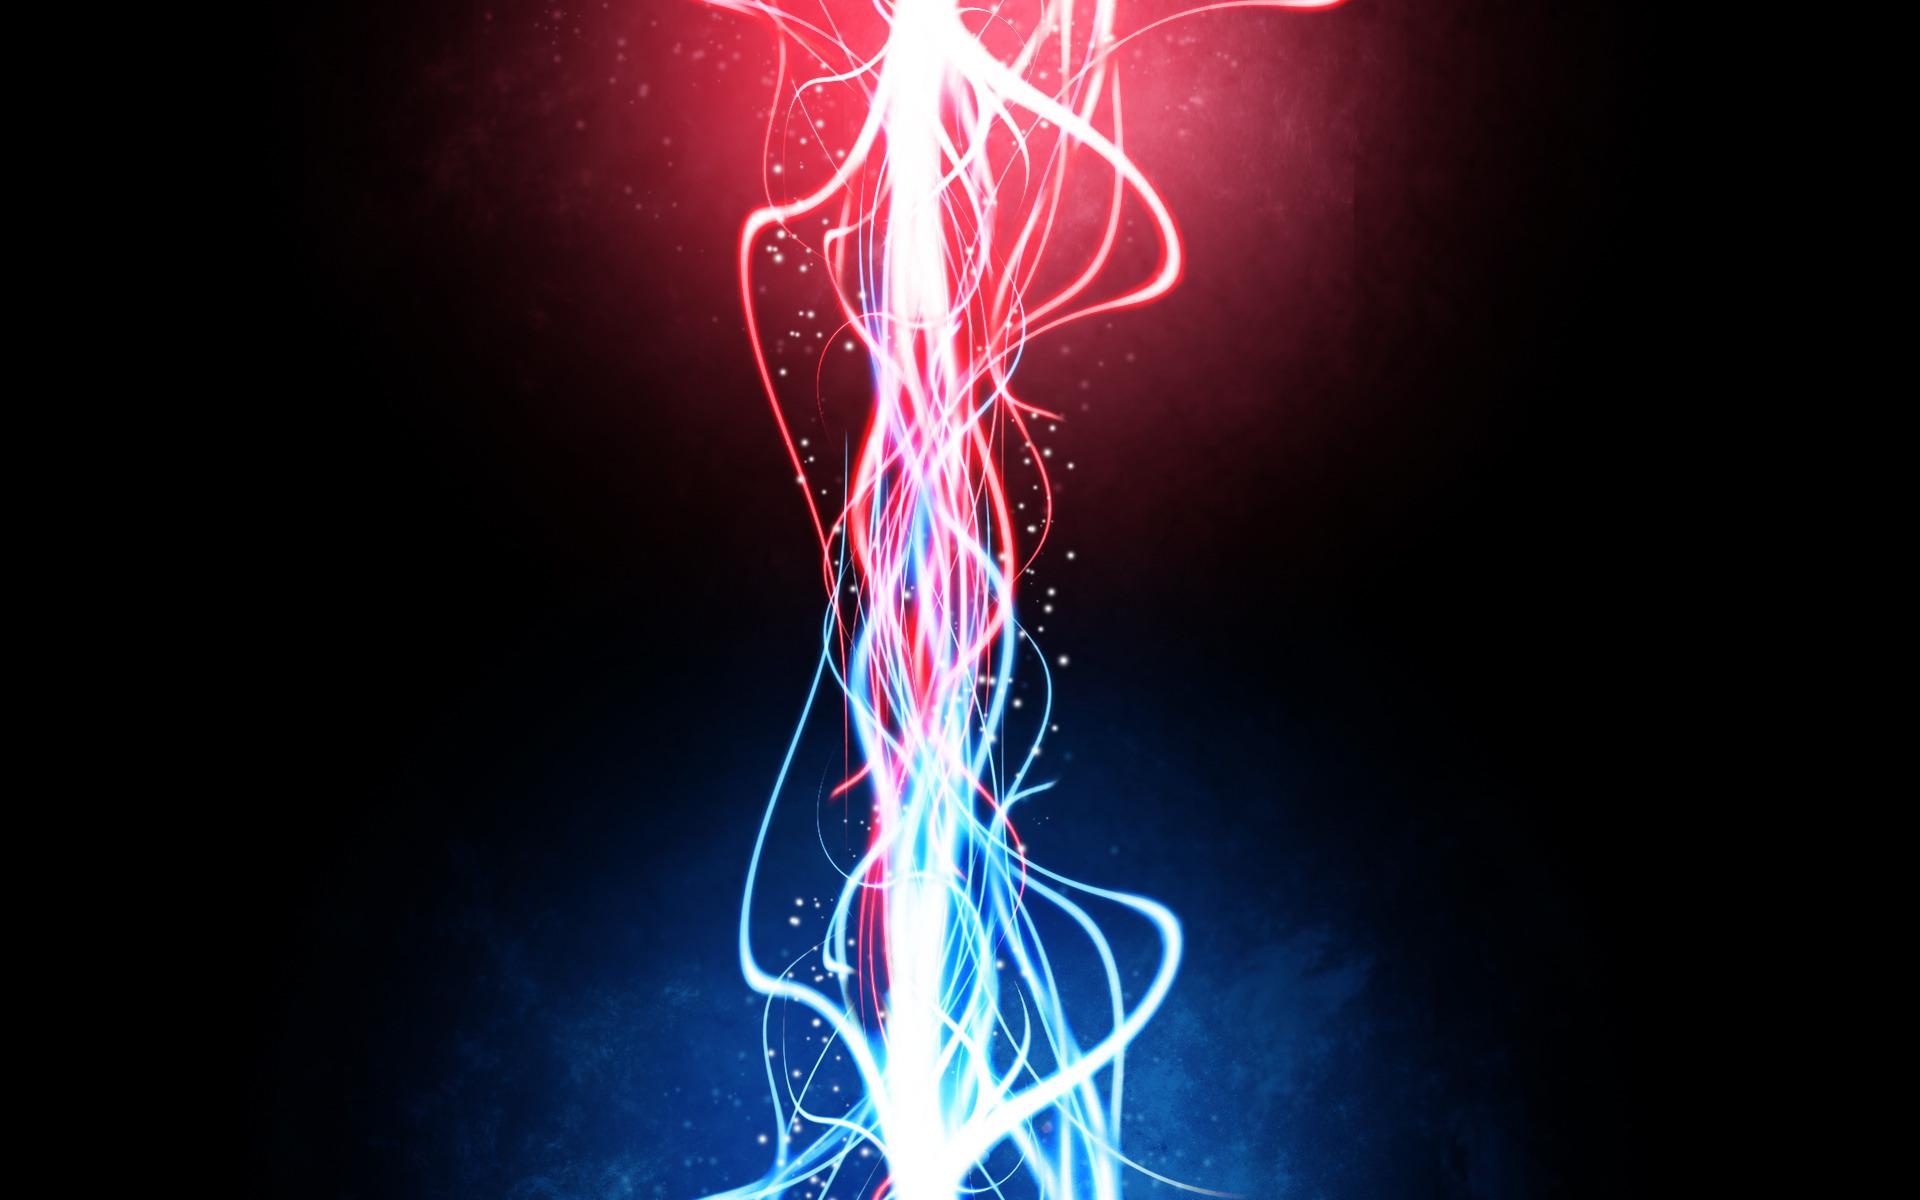 amazing neon lights wallpaper 24352